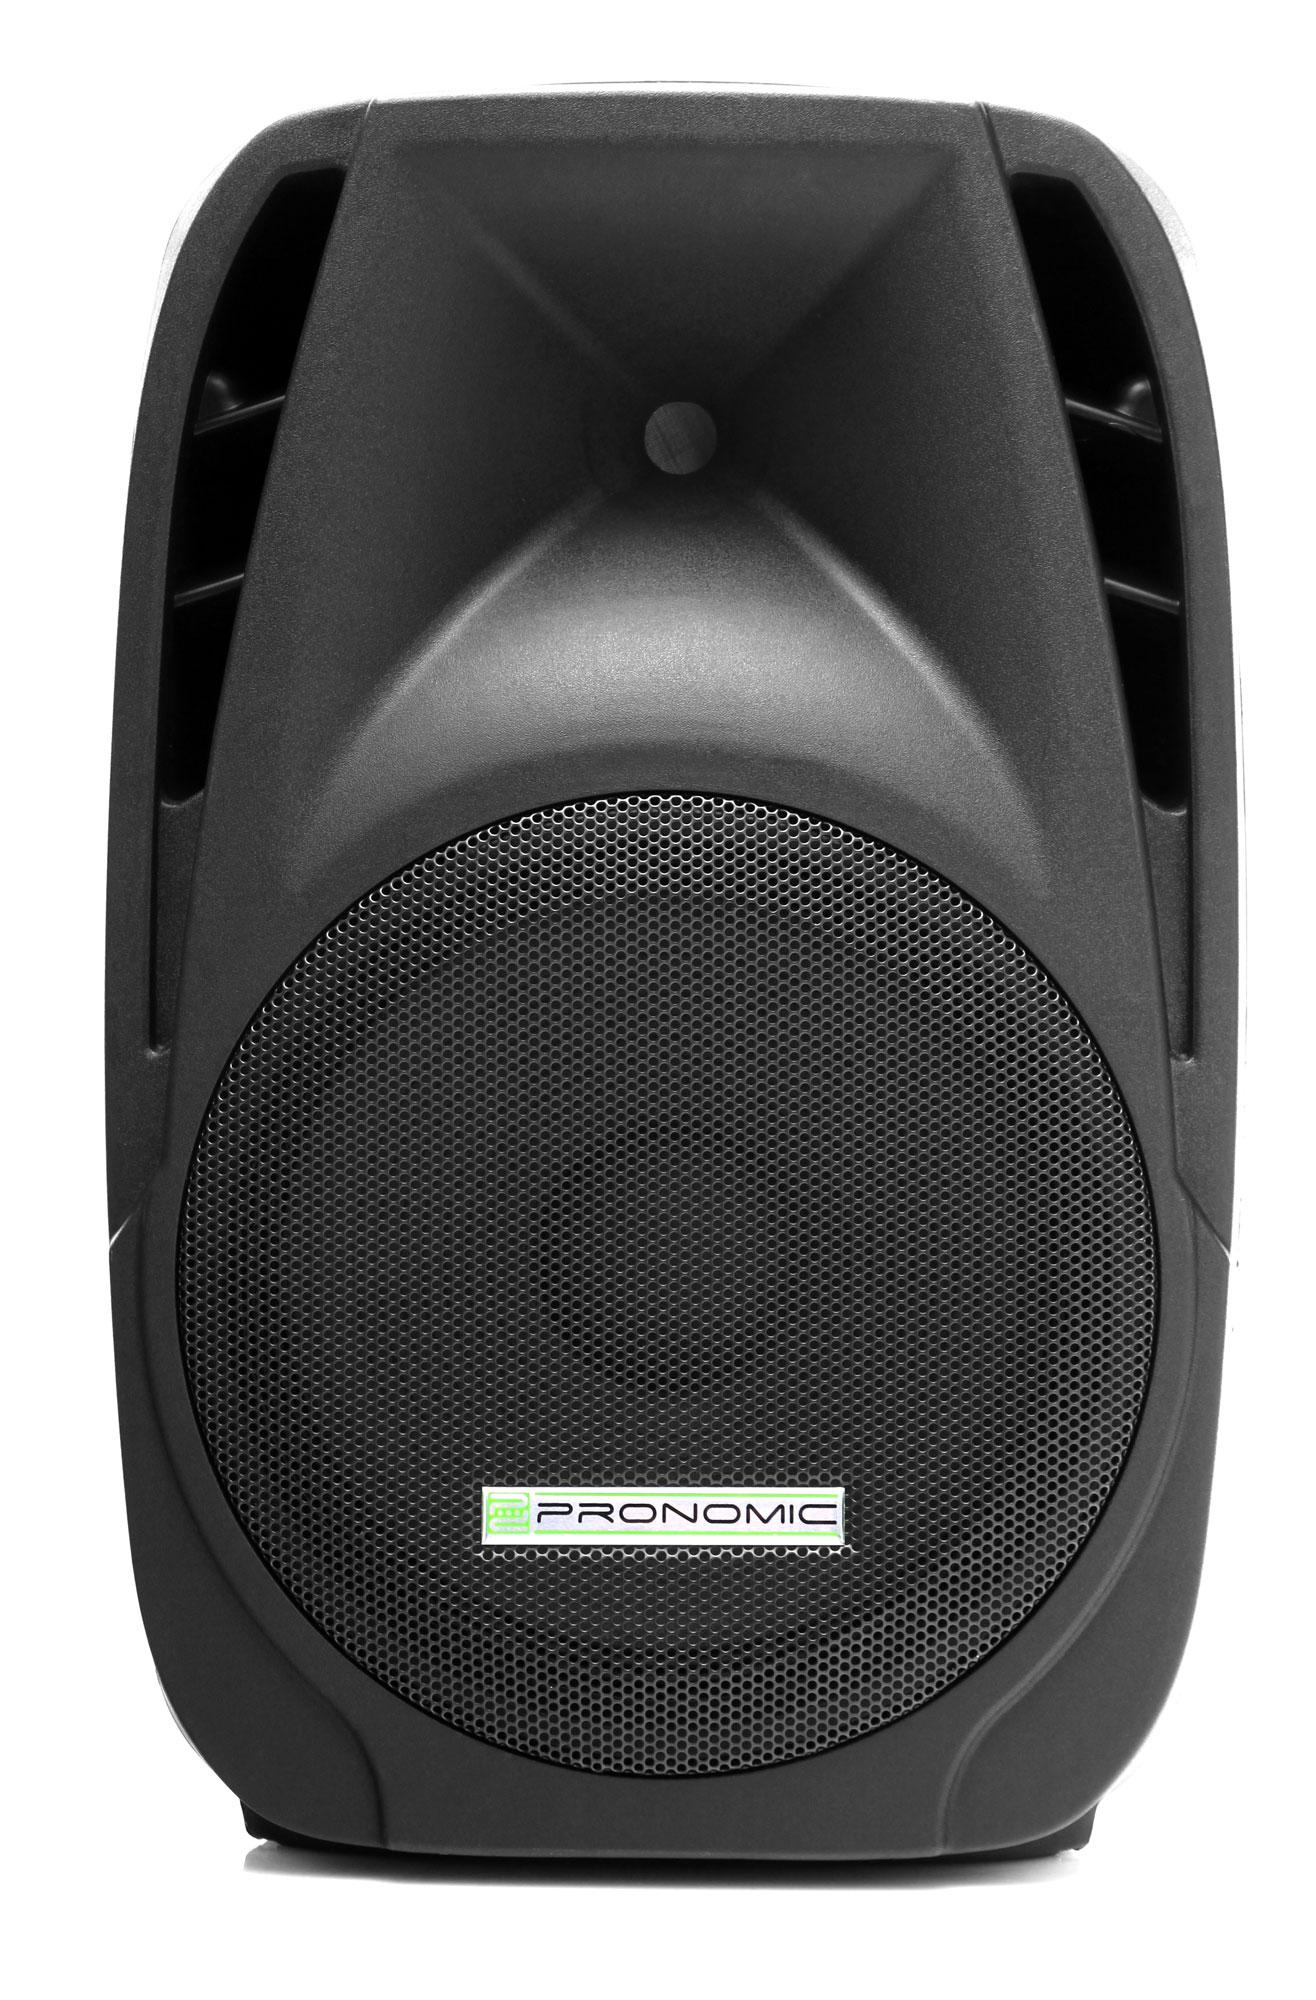 pronomic ph12a aktivbox lautsprecher mp3 bluetooth 150 300. Black Bedroom Furniture Sets. Home Design Ideas